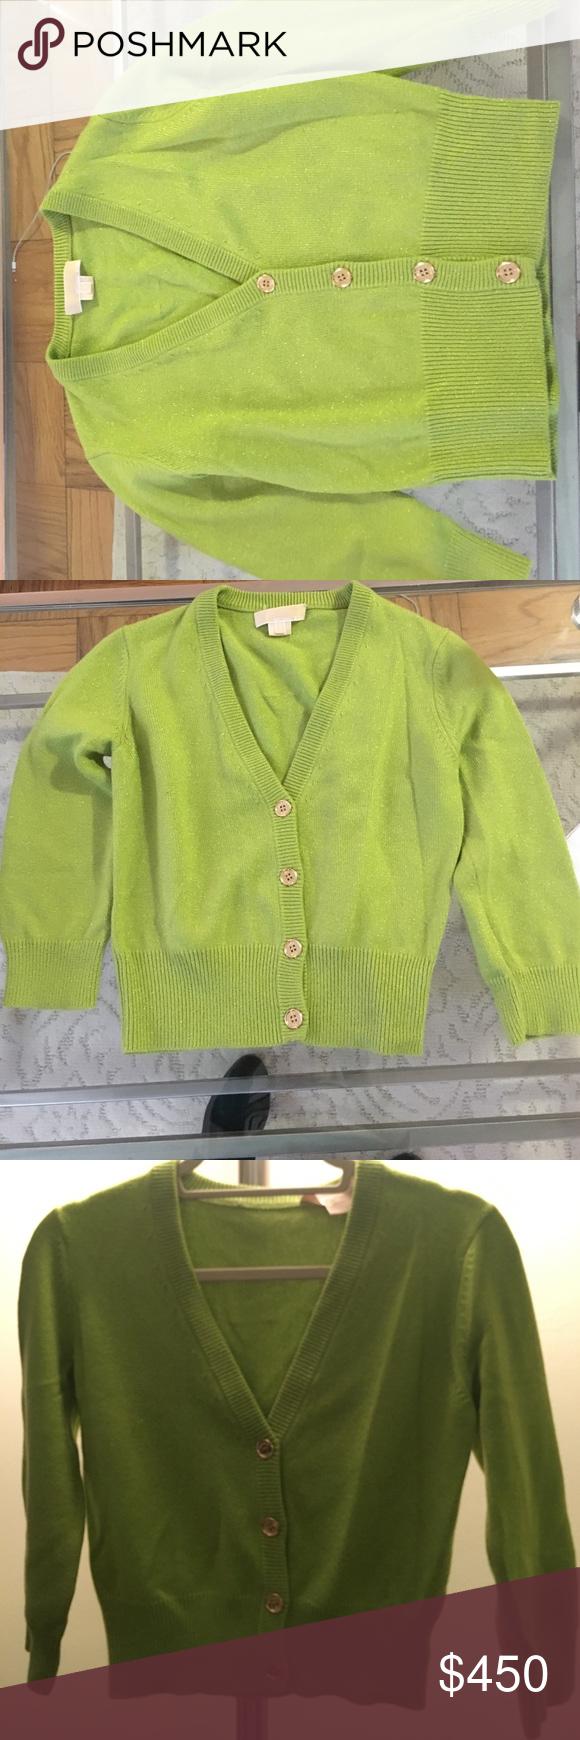 Michael Kors cashmere cardigan | Sweater cardigan, I am and The o'jays